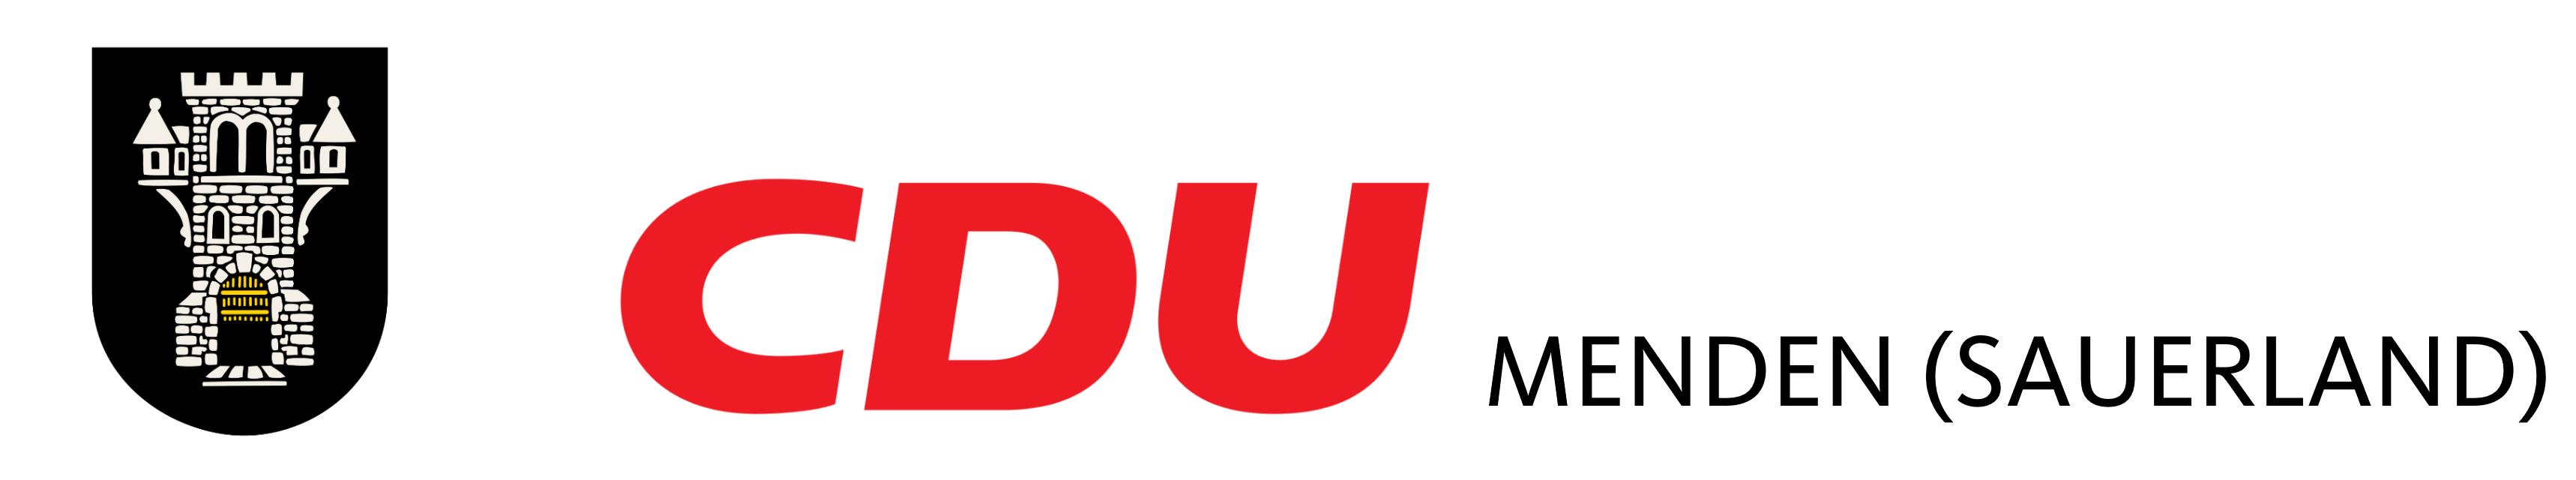 CDU Menden